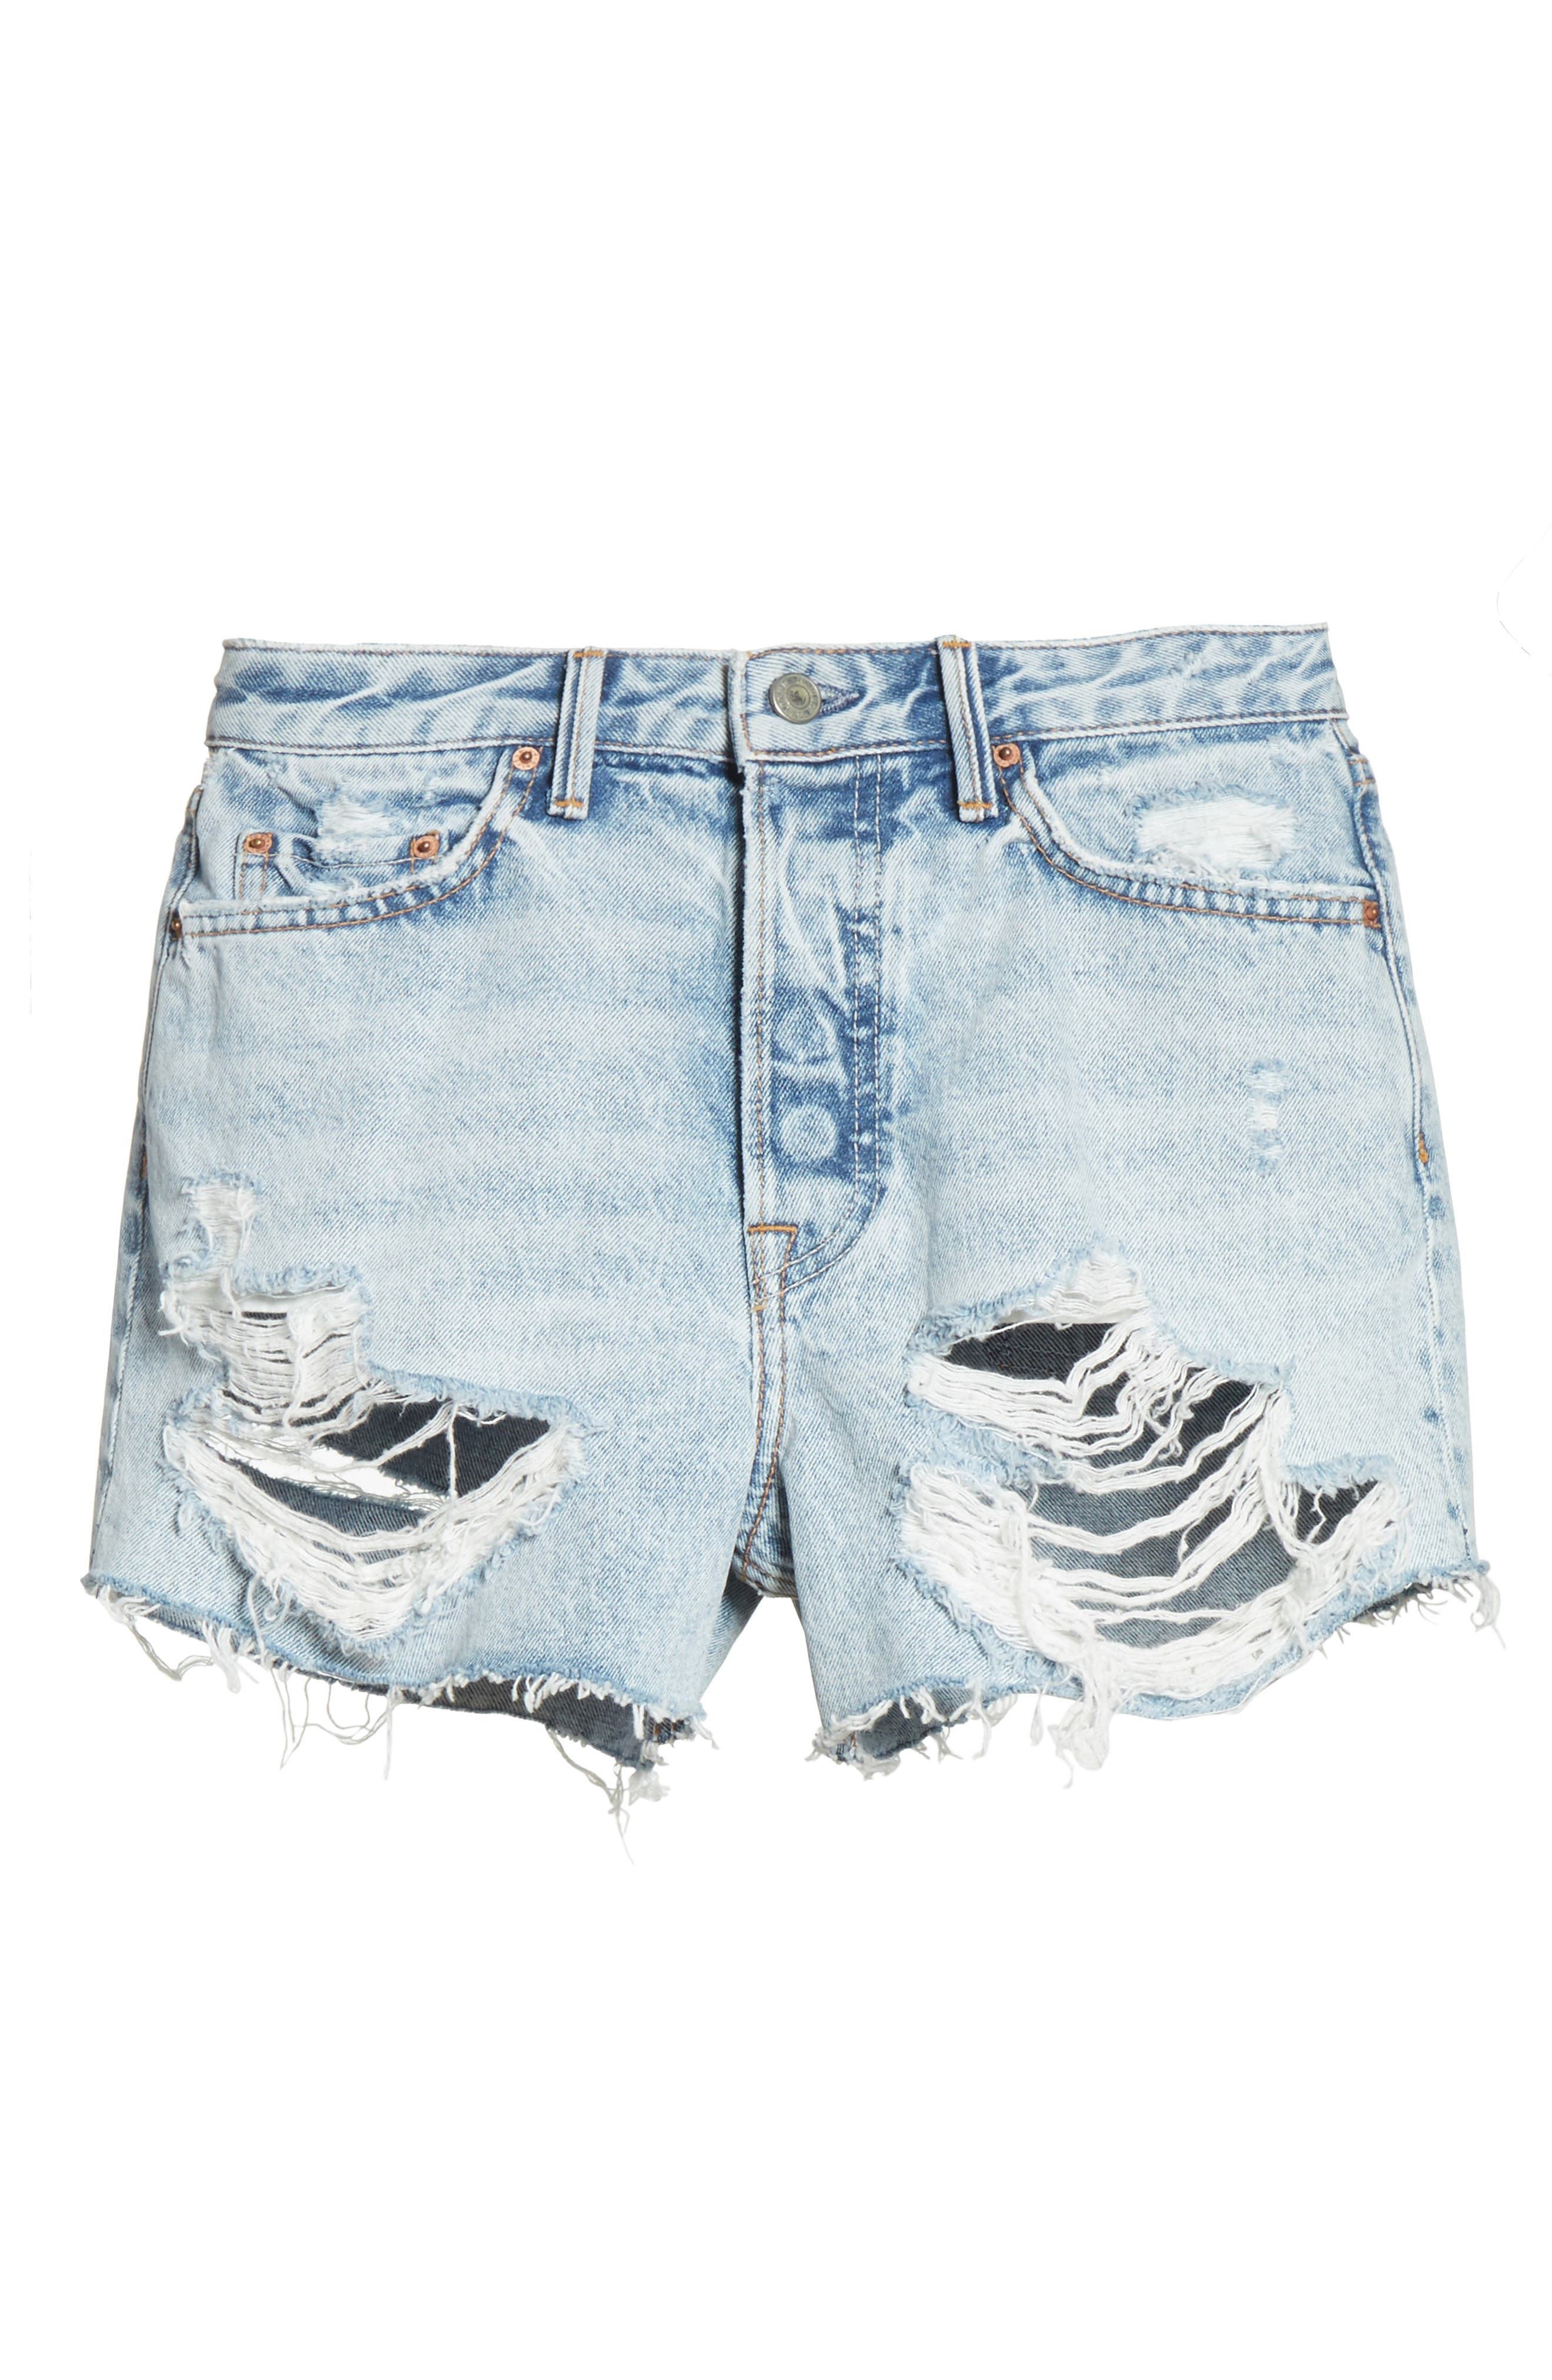 Helena Ripped Denim Shorts,                             Alternate thumbnail 6, color,                             489